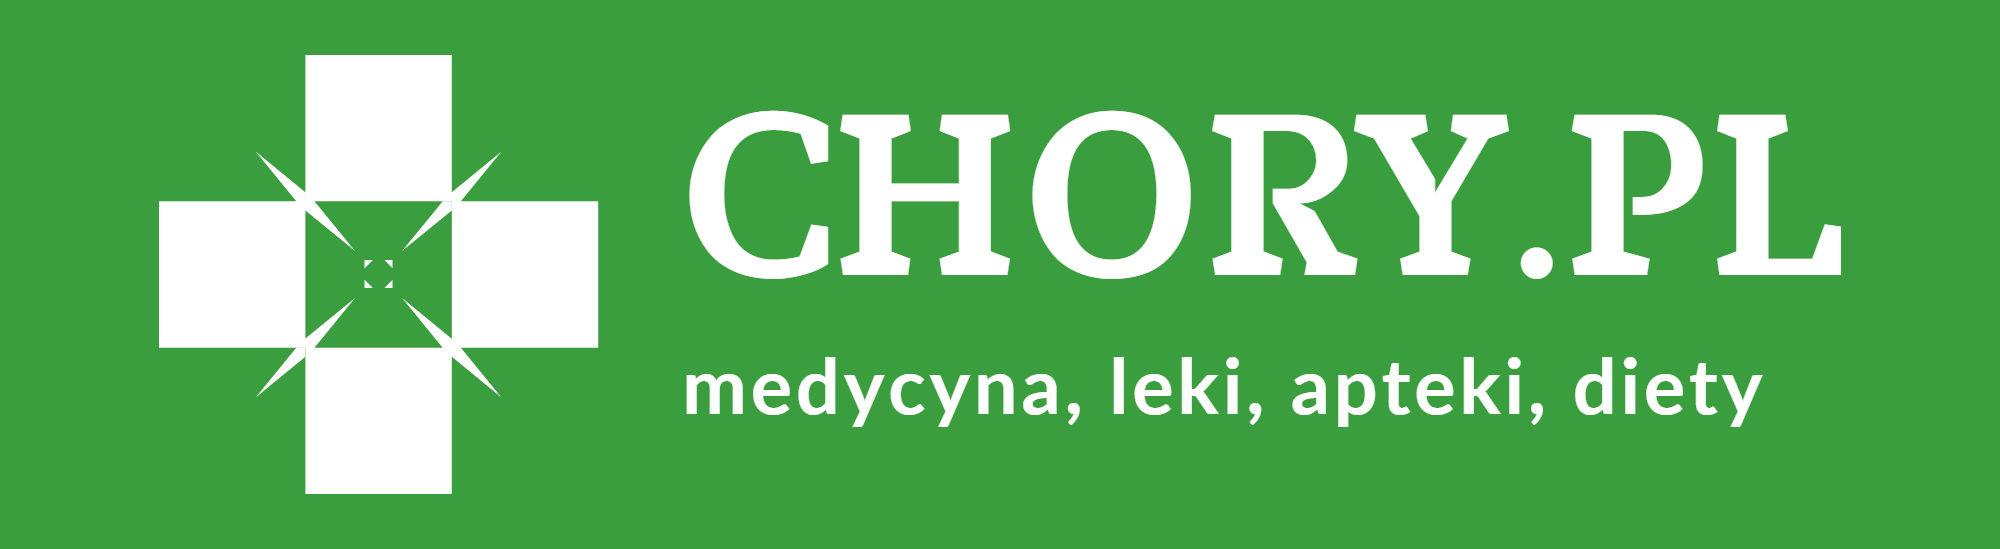 Chory.pl